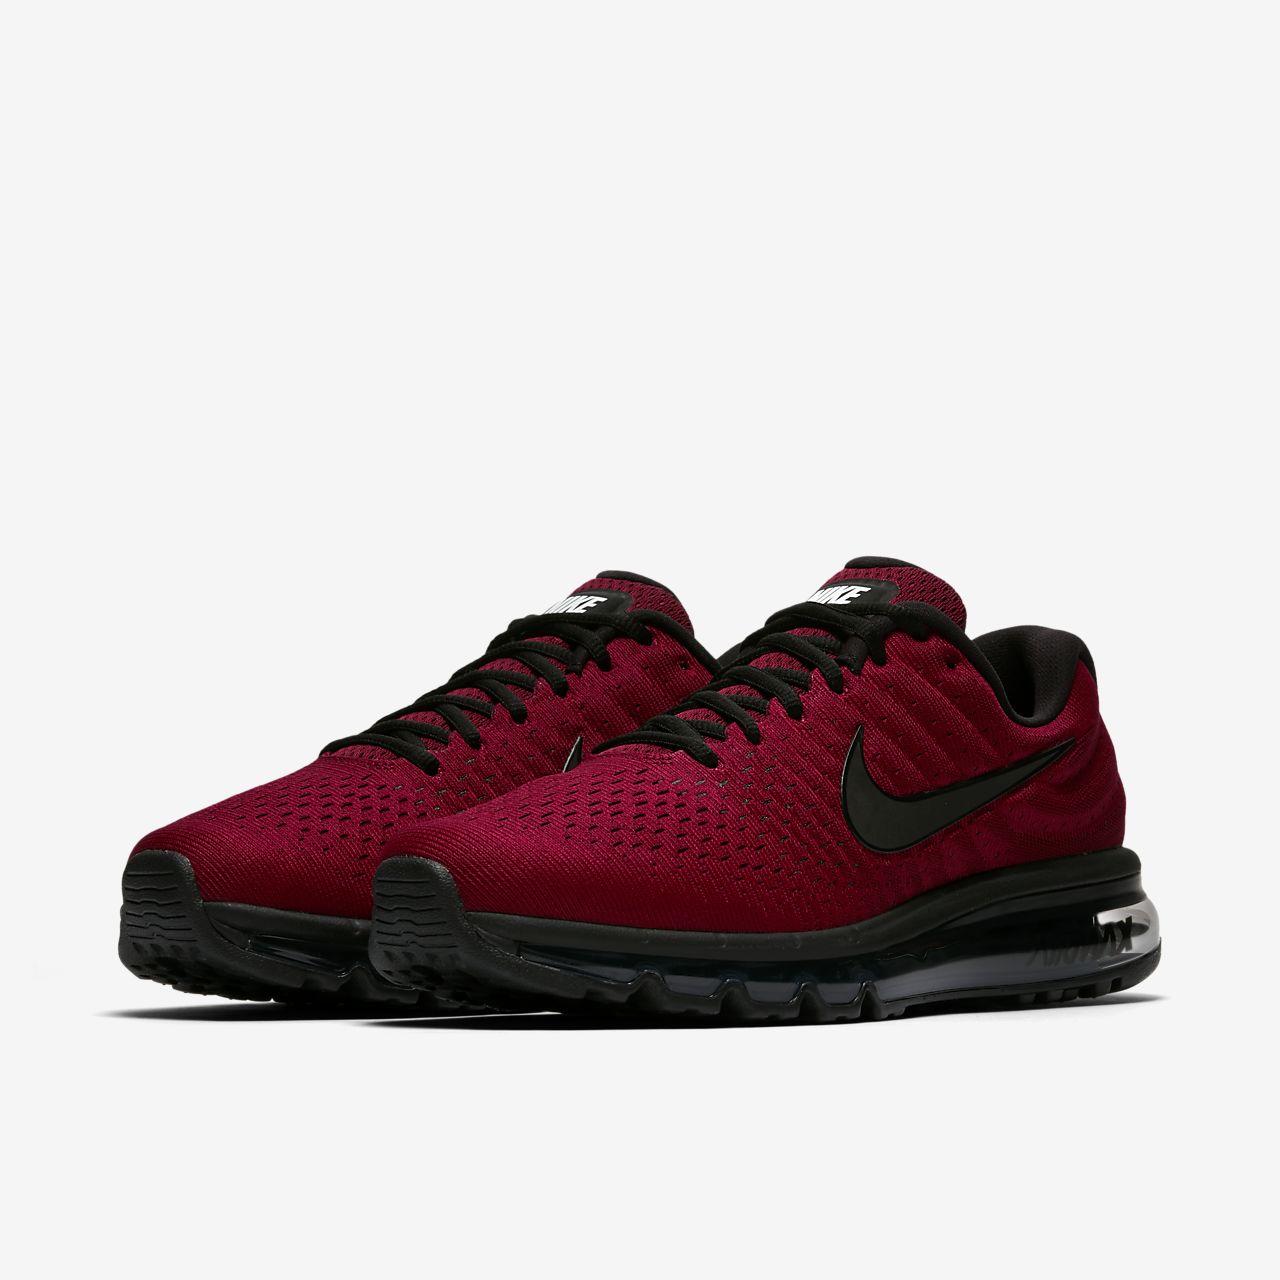 ... Nike Air Max 2017 Men's Running Shoe